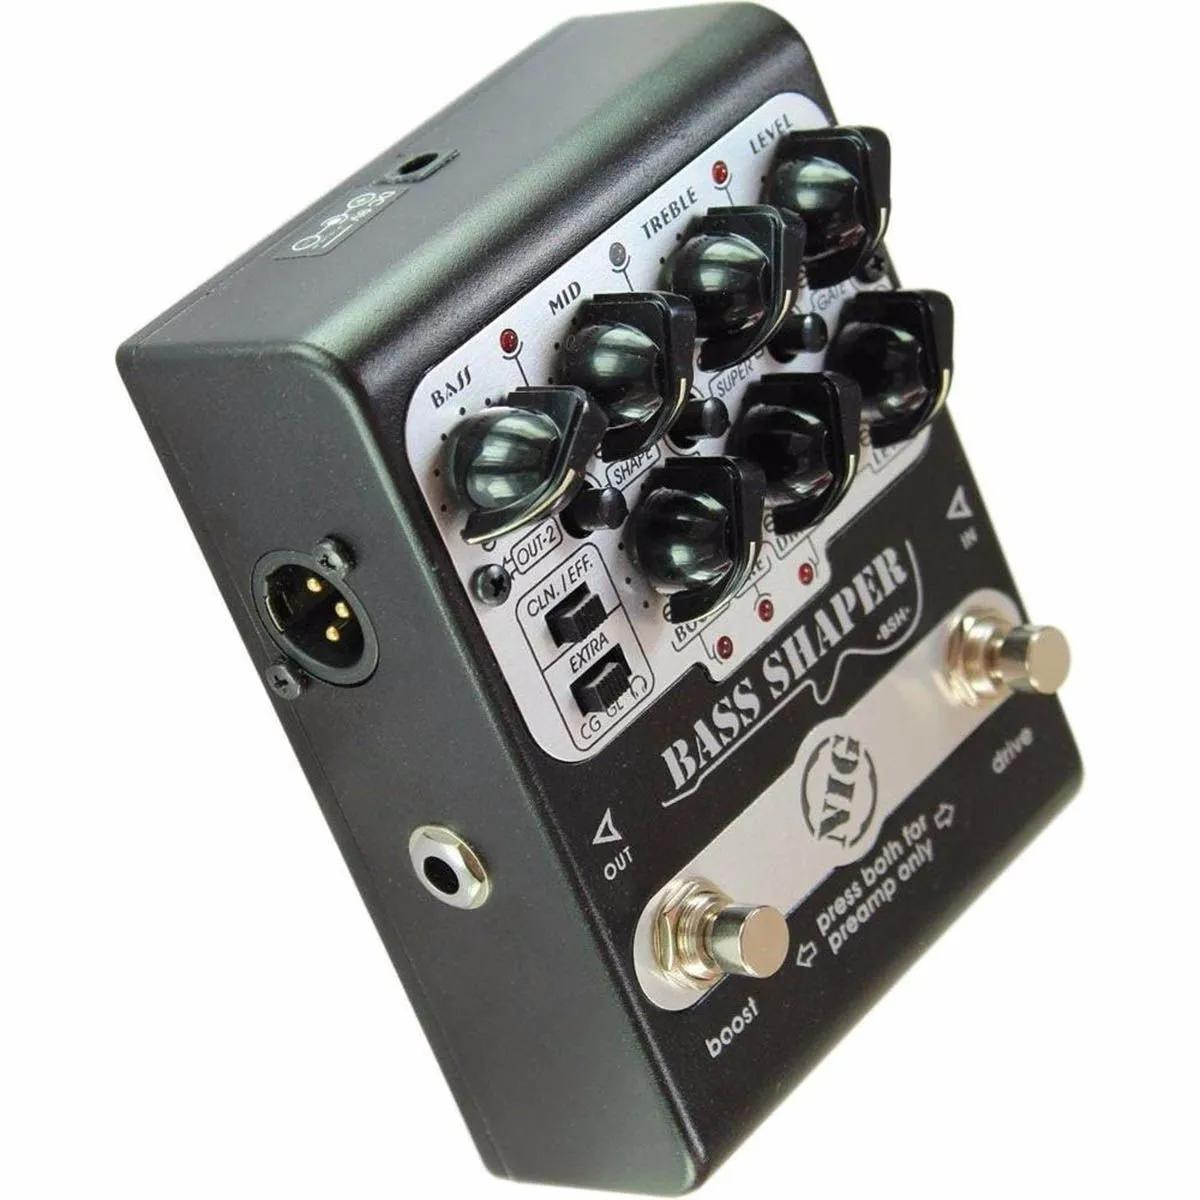 Pedal Nig BSH Bass Shaper Overdrive/Booster